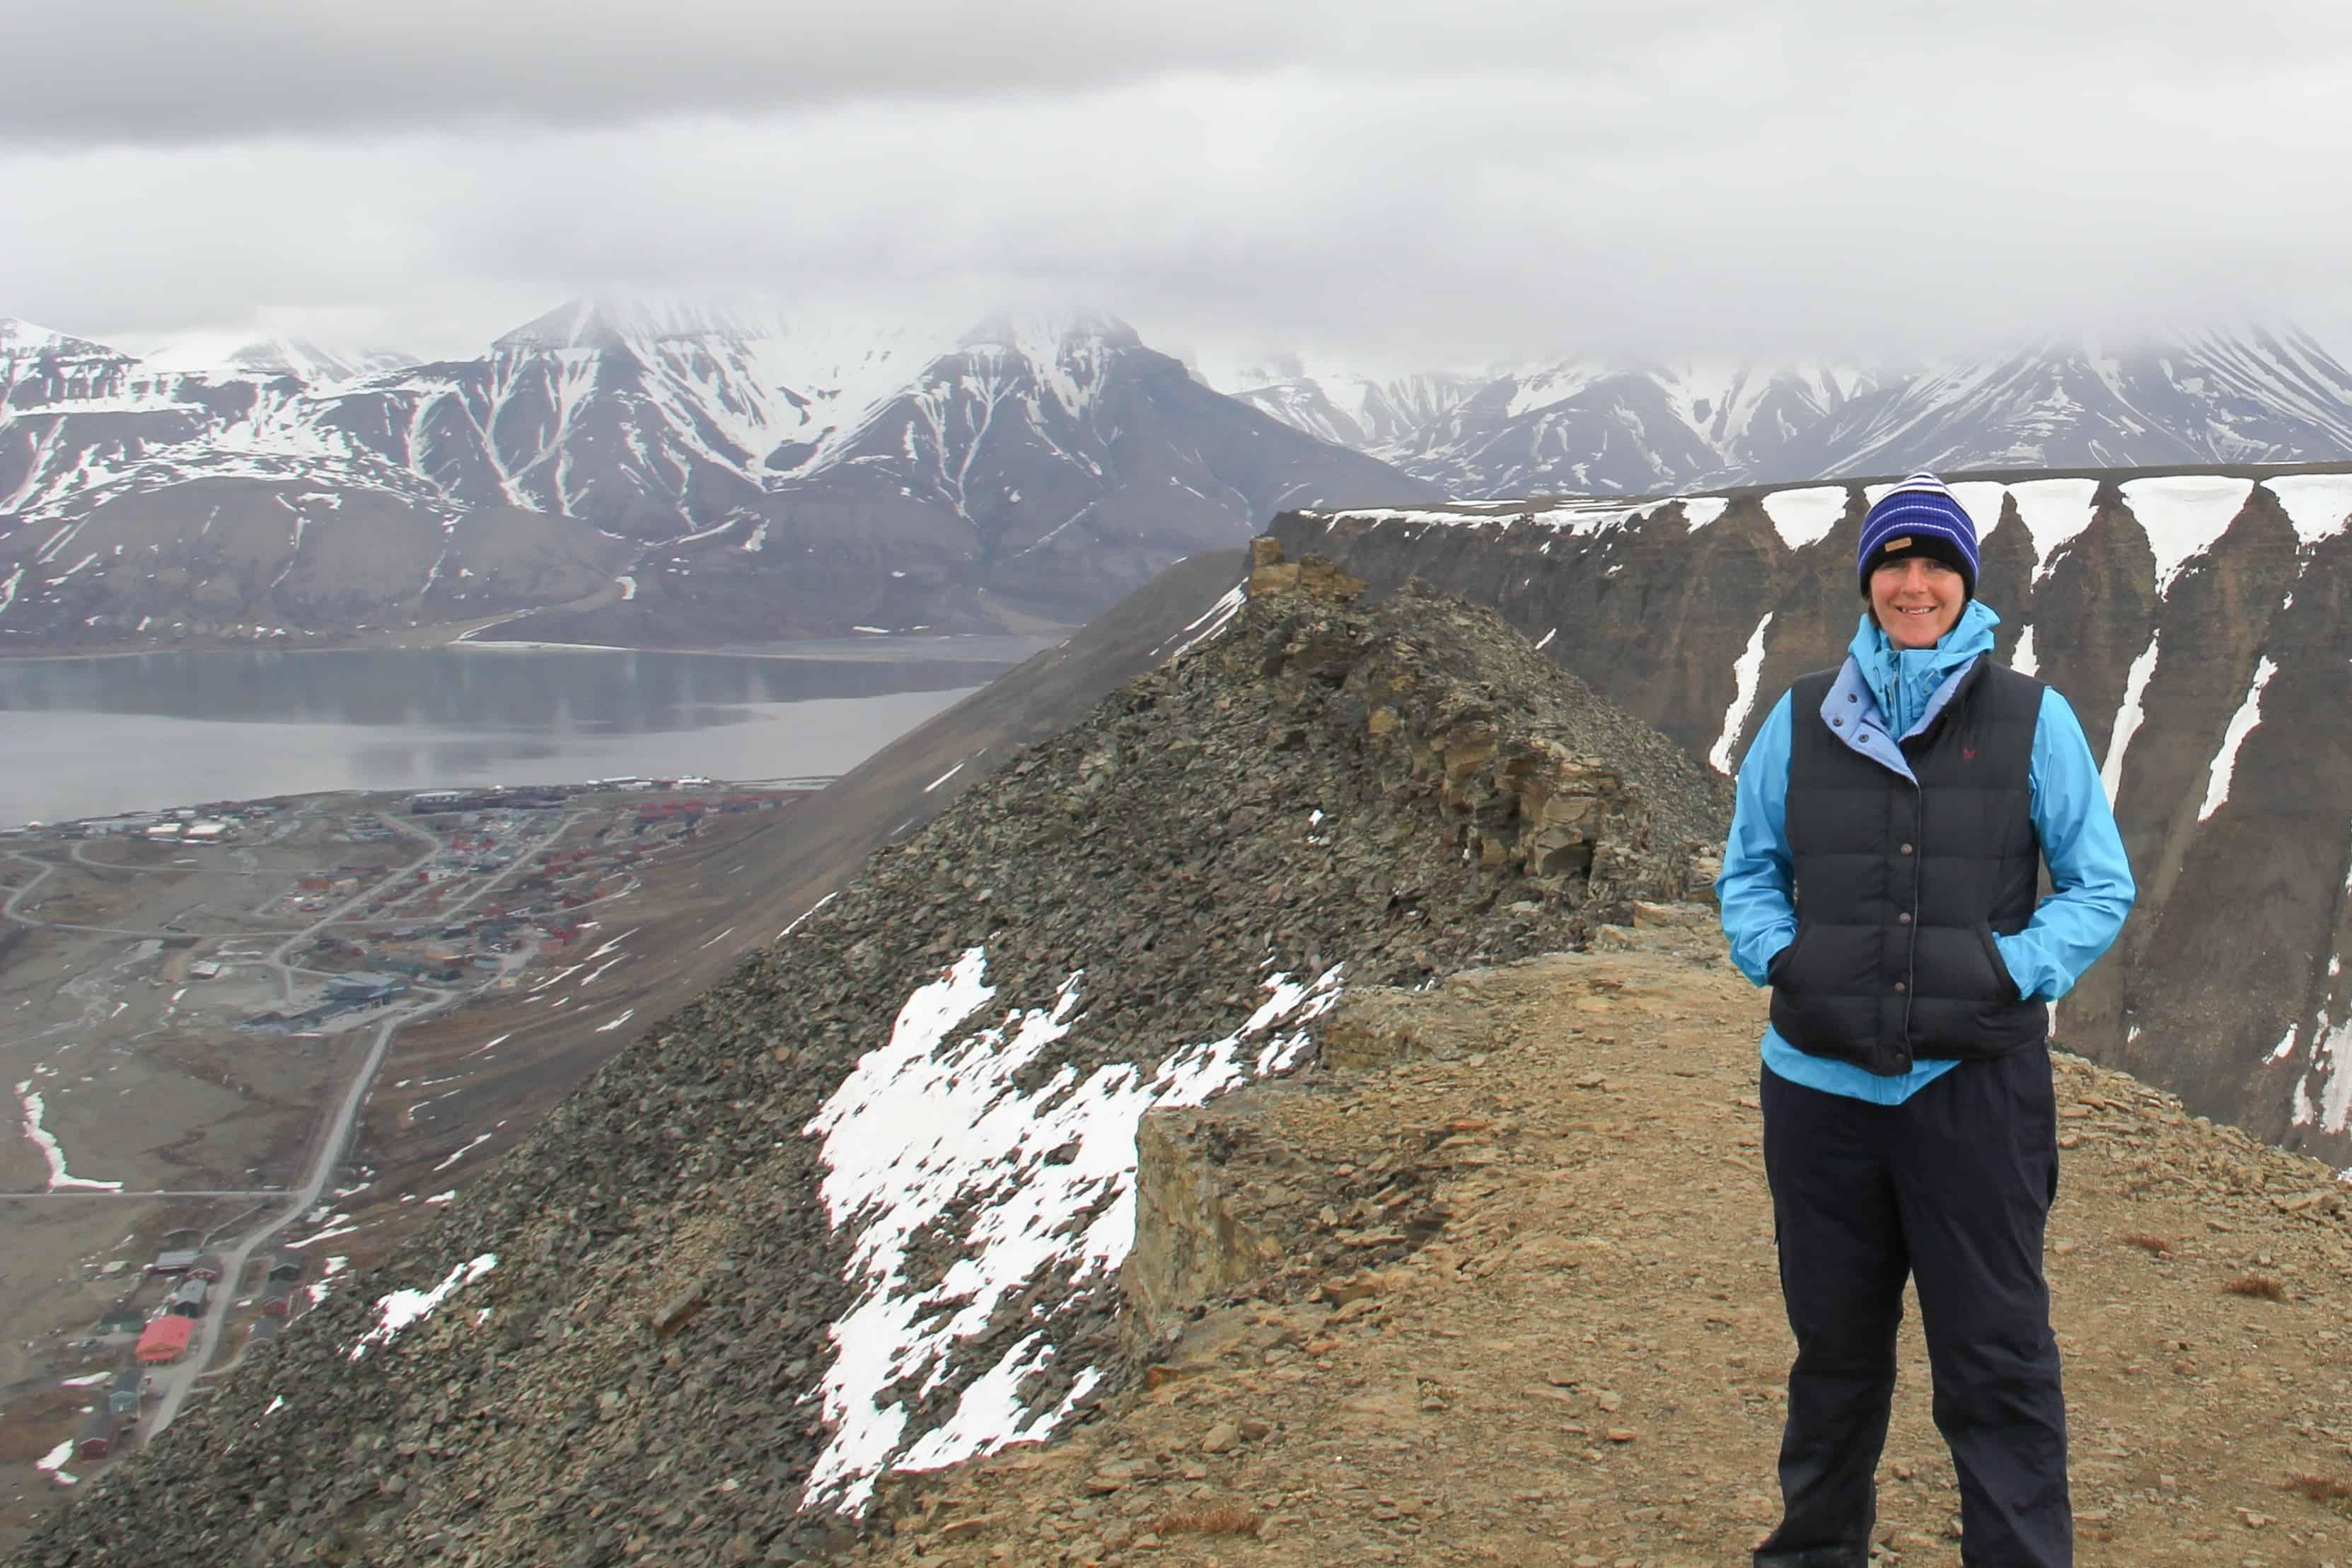 Claire Winter adventure coaching